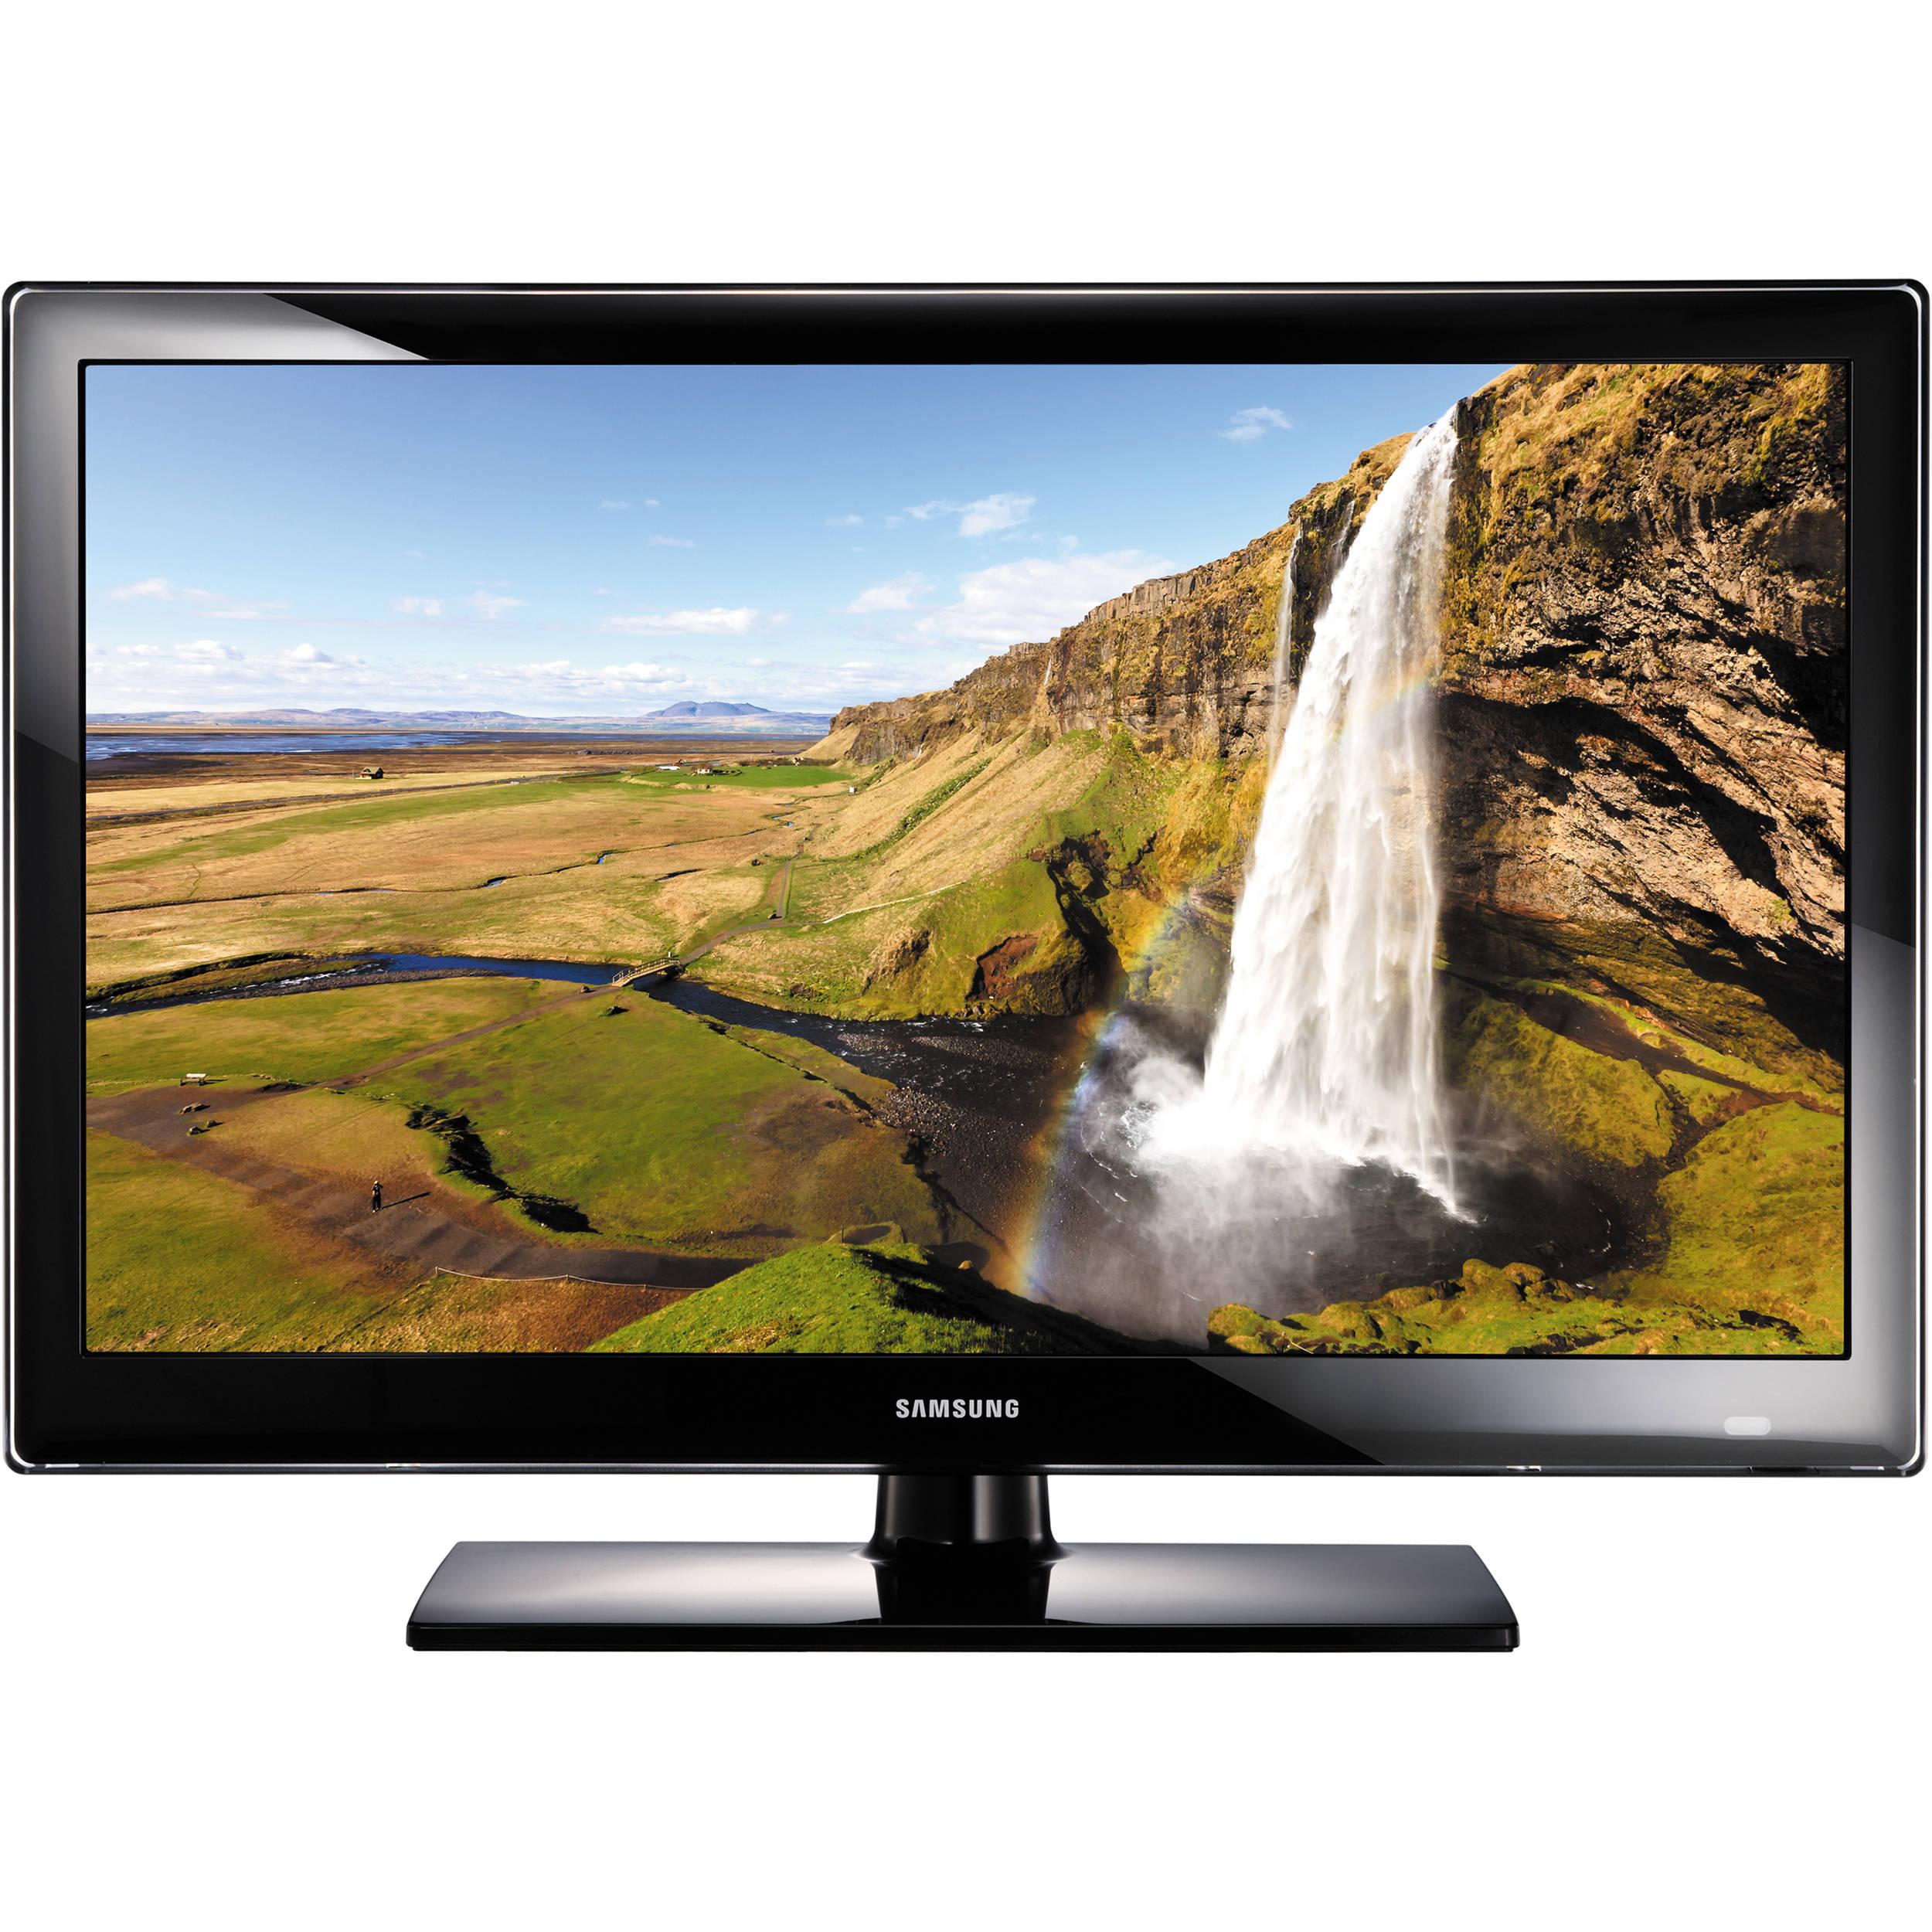 Samsung Ua 32eh4500 32 Multisystem Smart Led Tv